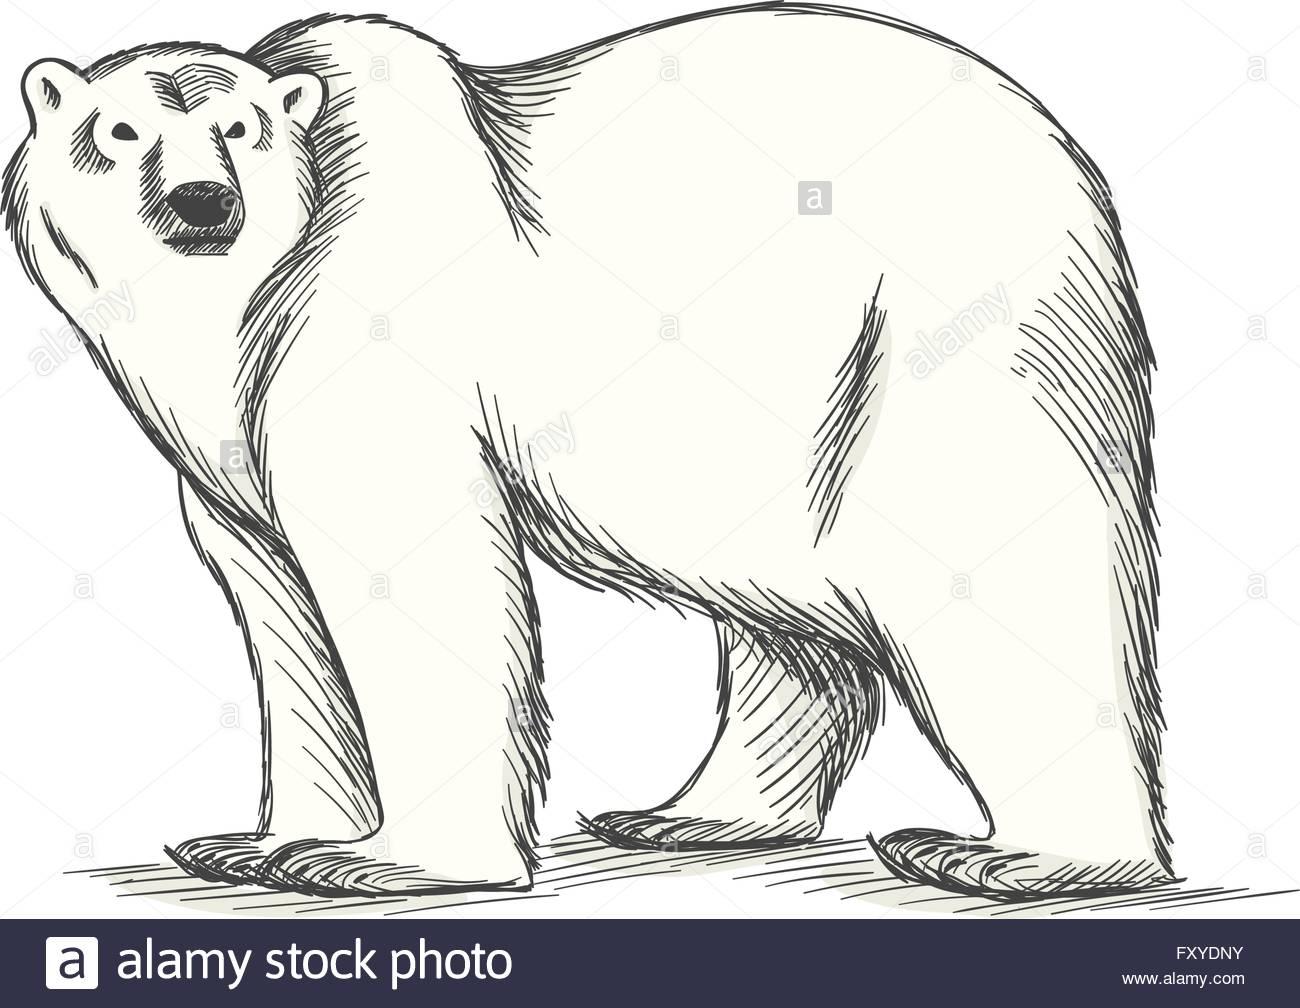 polar bear hand drawn illustration stock vector art u0026 illustration